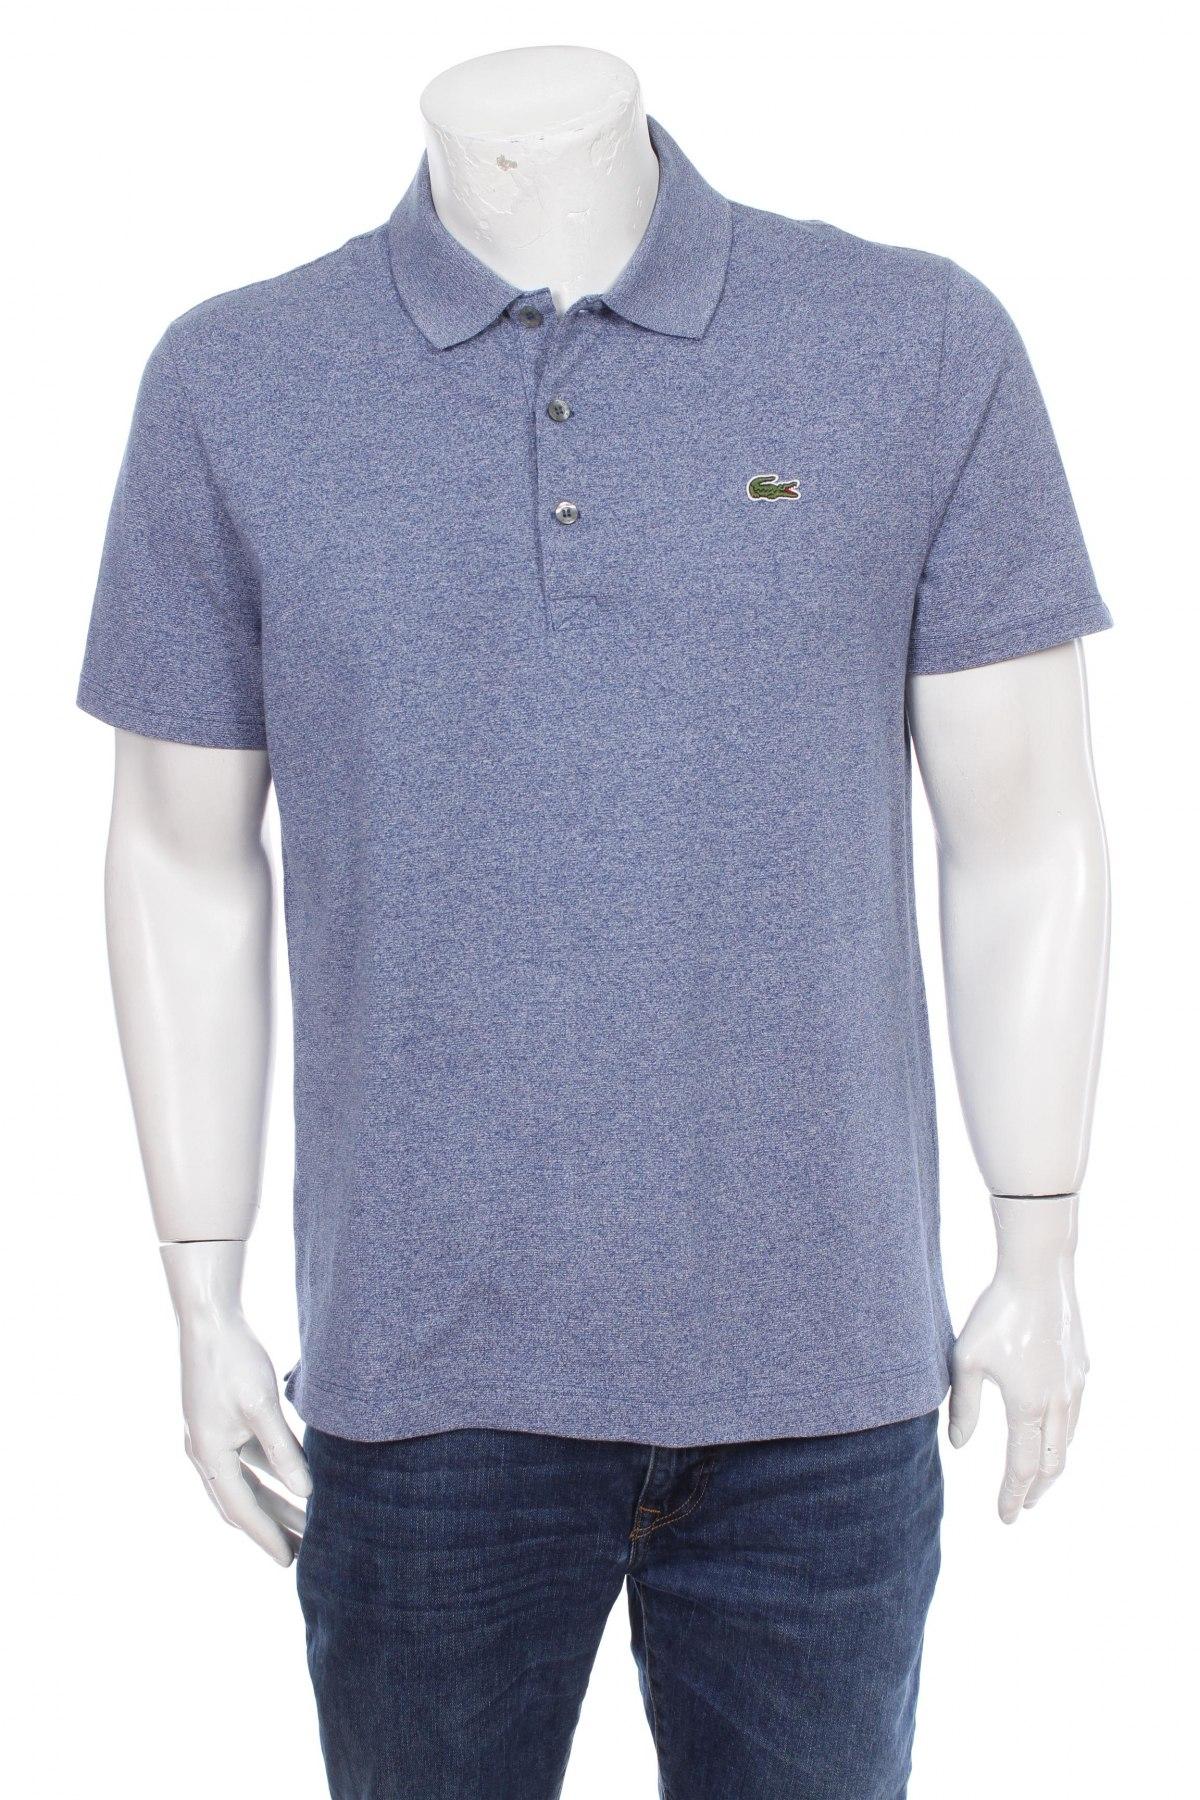 88bb5d3cee38 Ανδρικό t-shirt Lacoste - σε συμφέρουσα τιμή στο Remix -  103298066